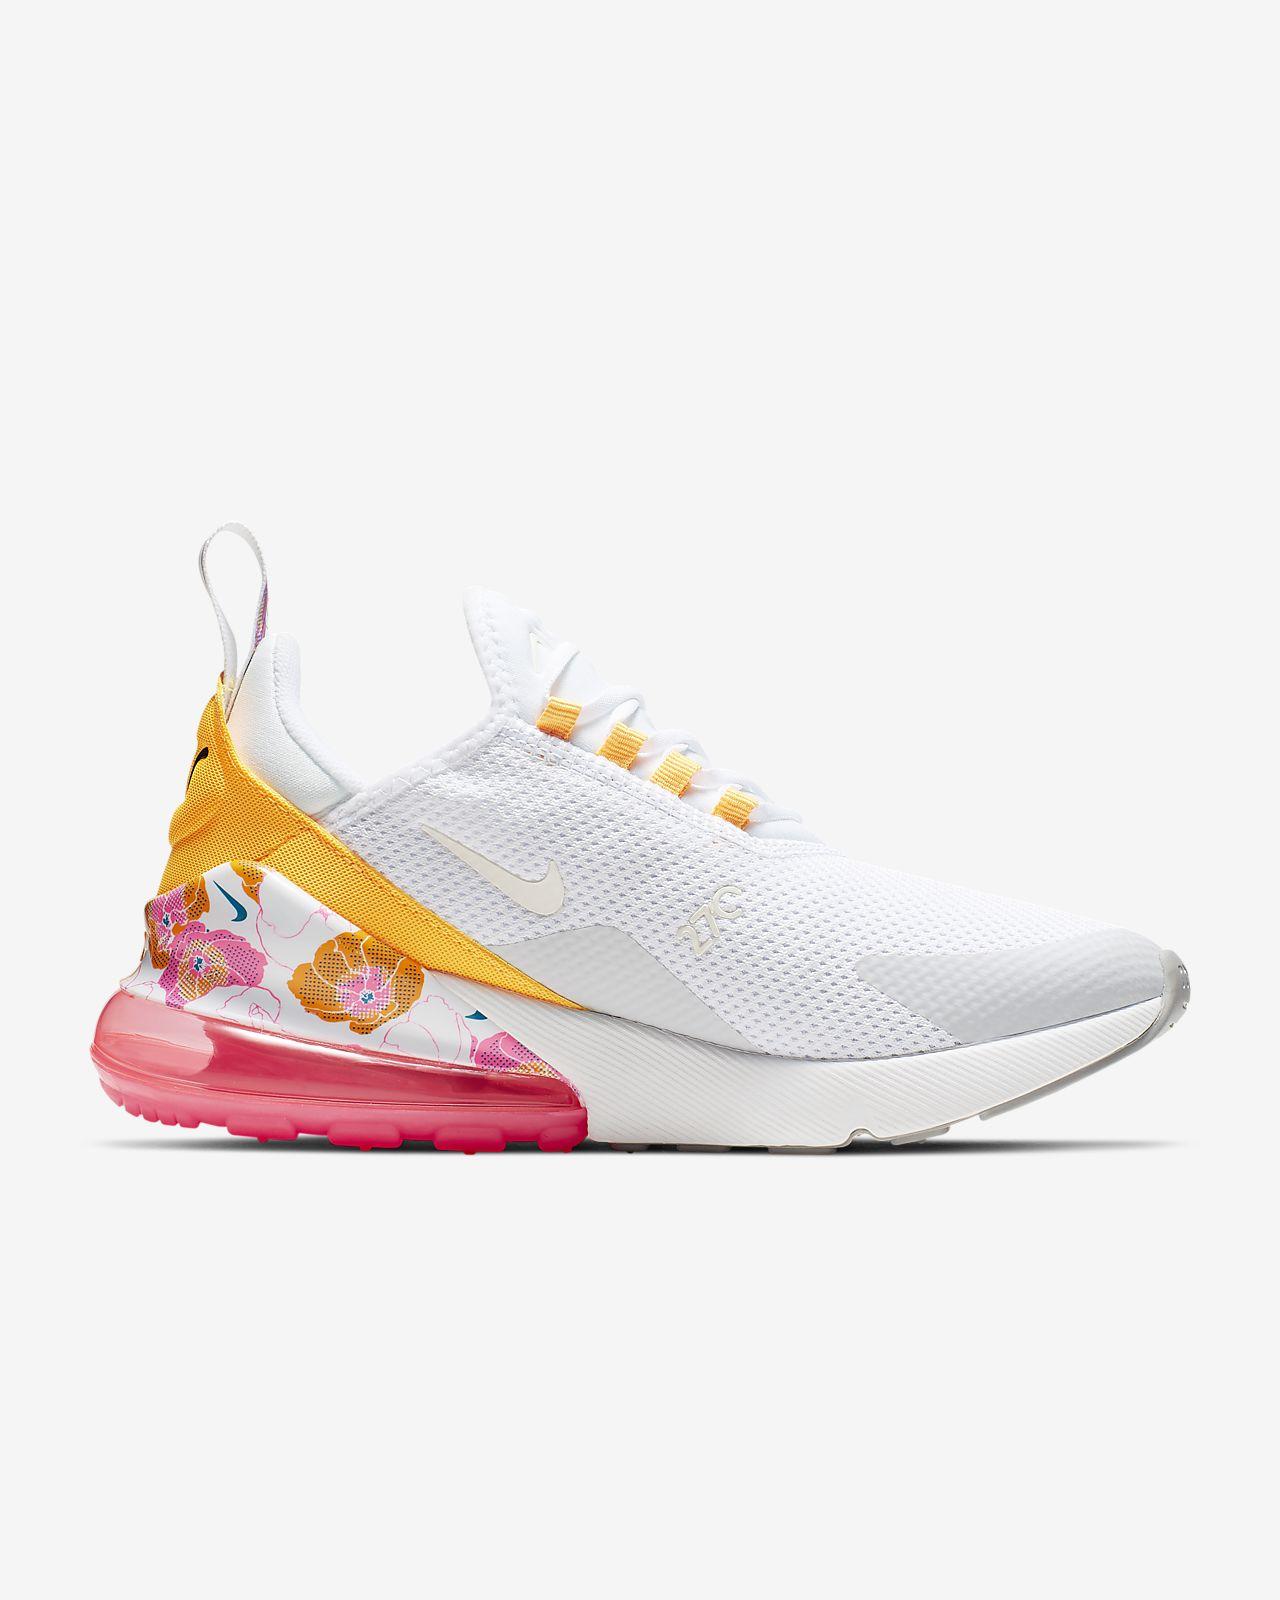 Nike Pour 270 Se Chaussure Max Floral Air Femme JcKlF1